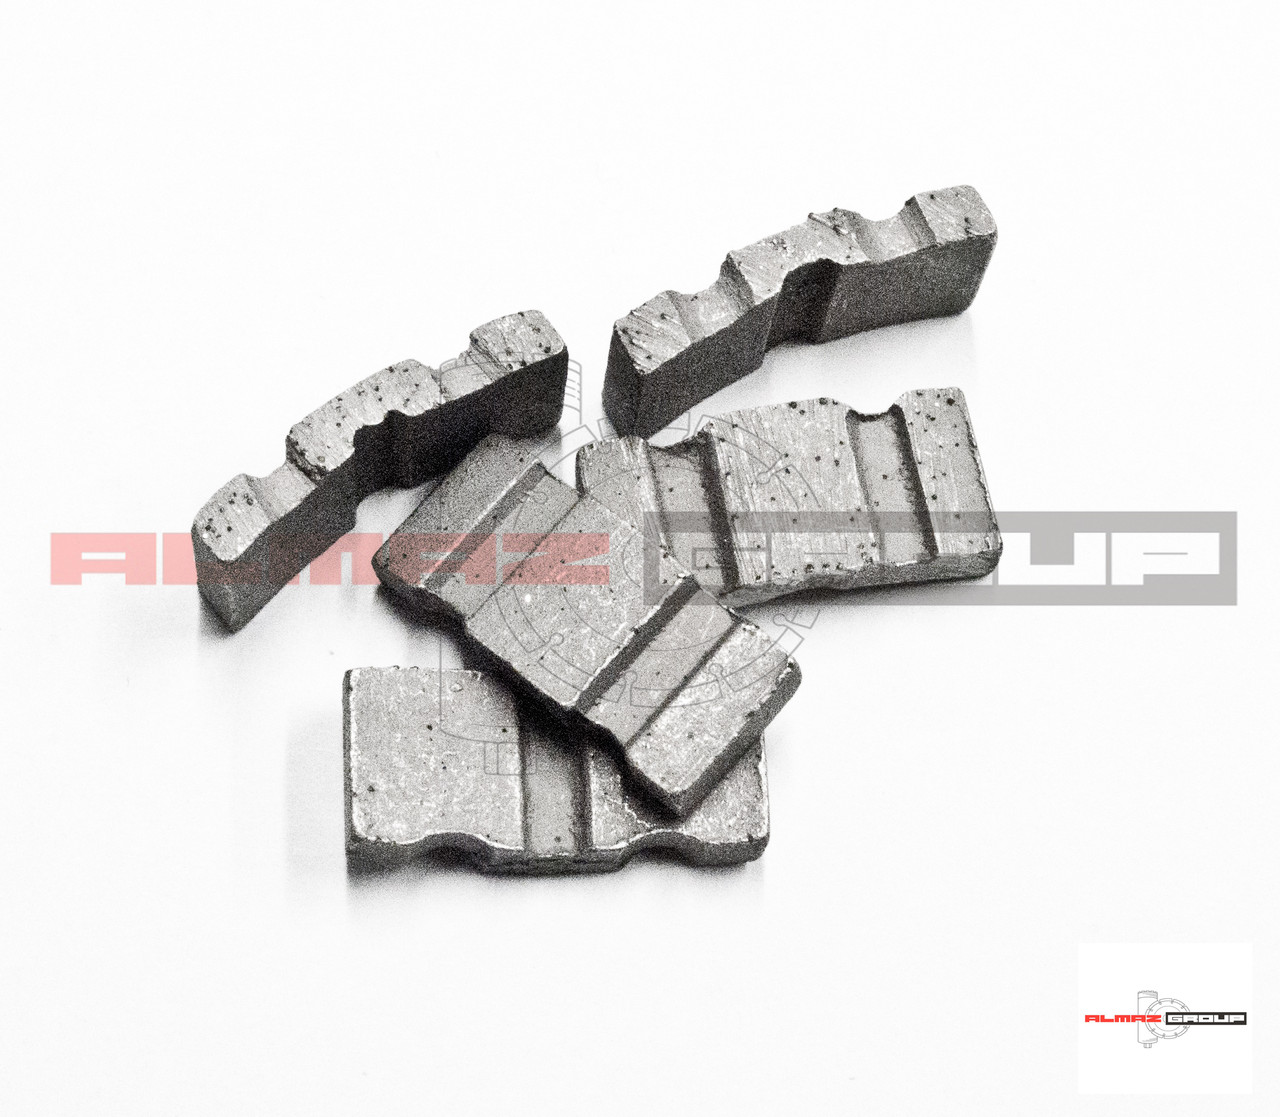 Реставрация алмазных коронок Ø 52 методом напайки сегмента  TURBO-X